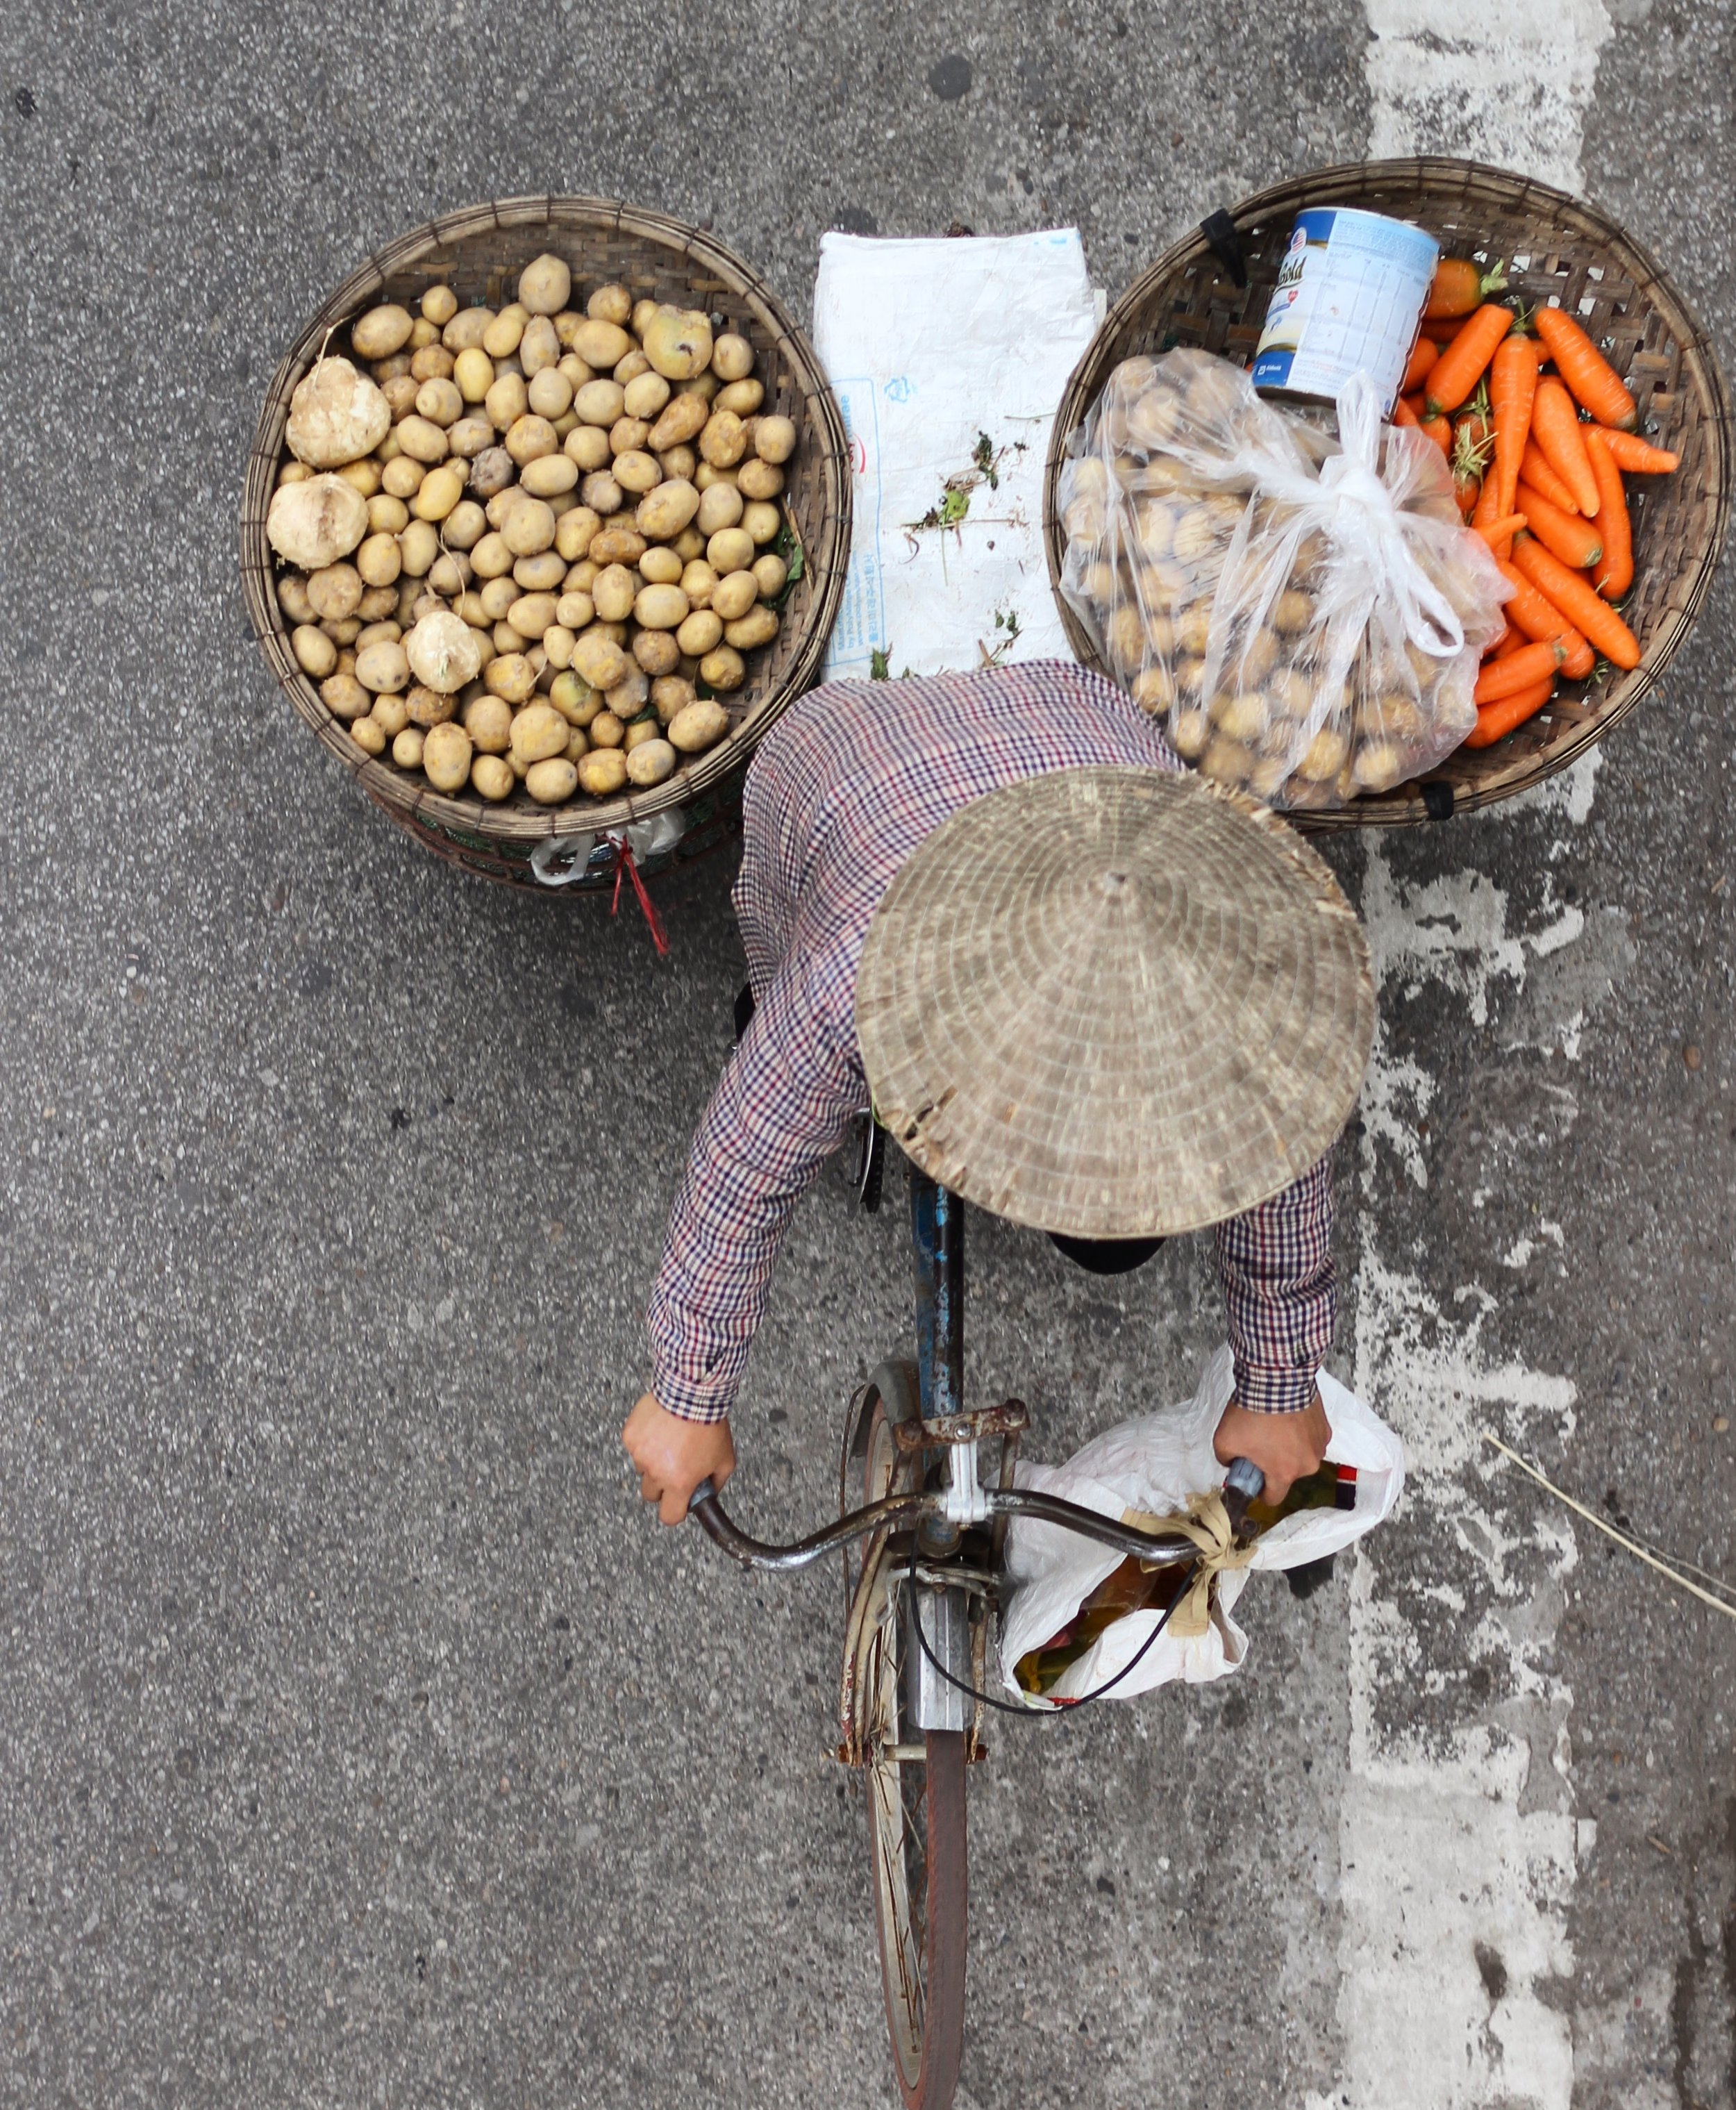 A woman biking through Hanoi with her vegetables.